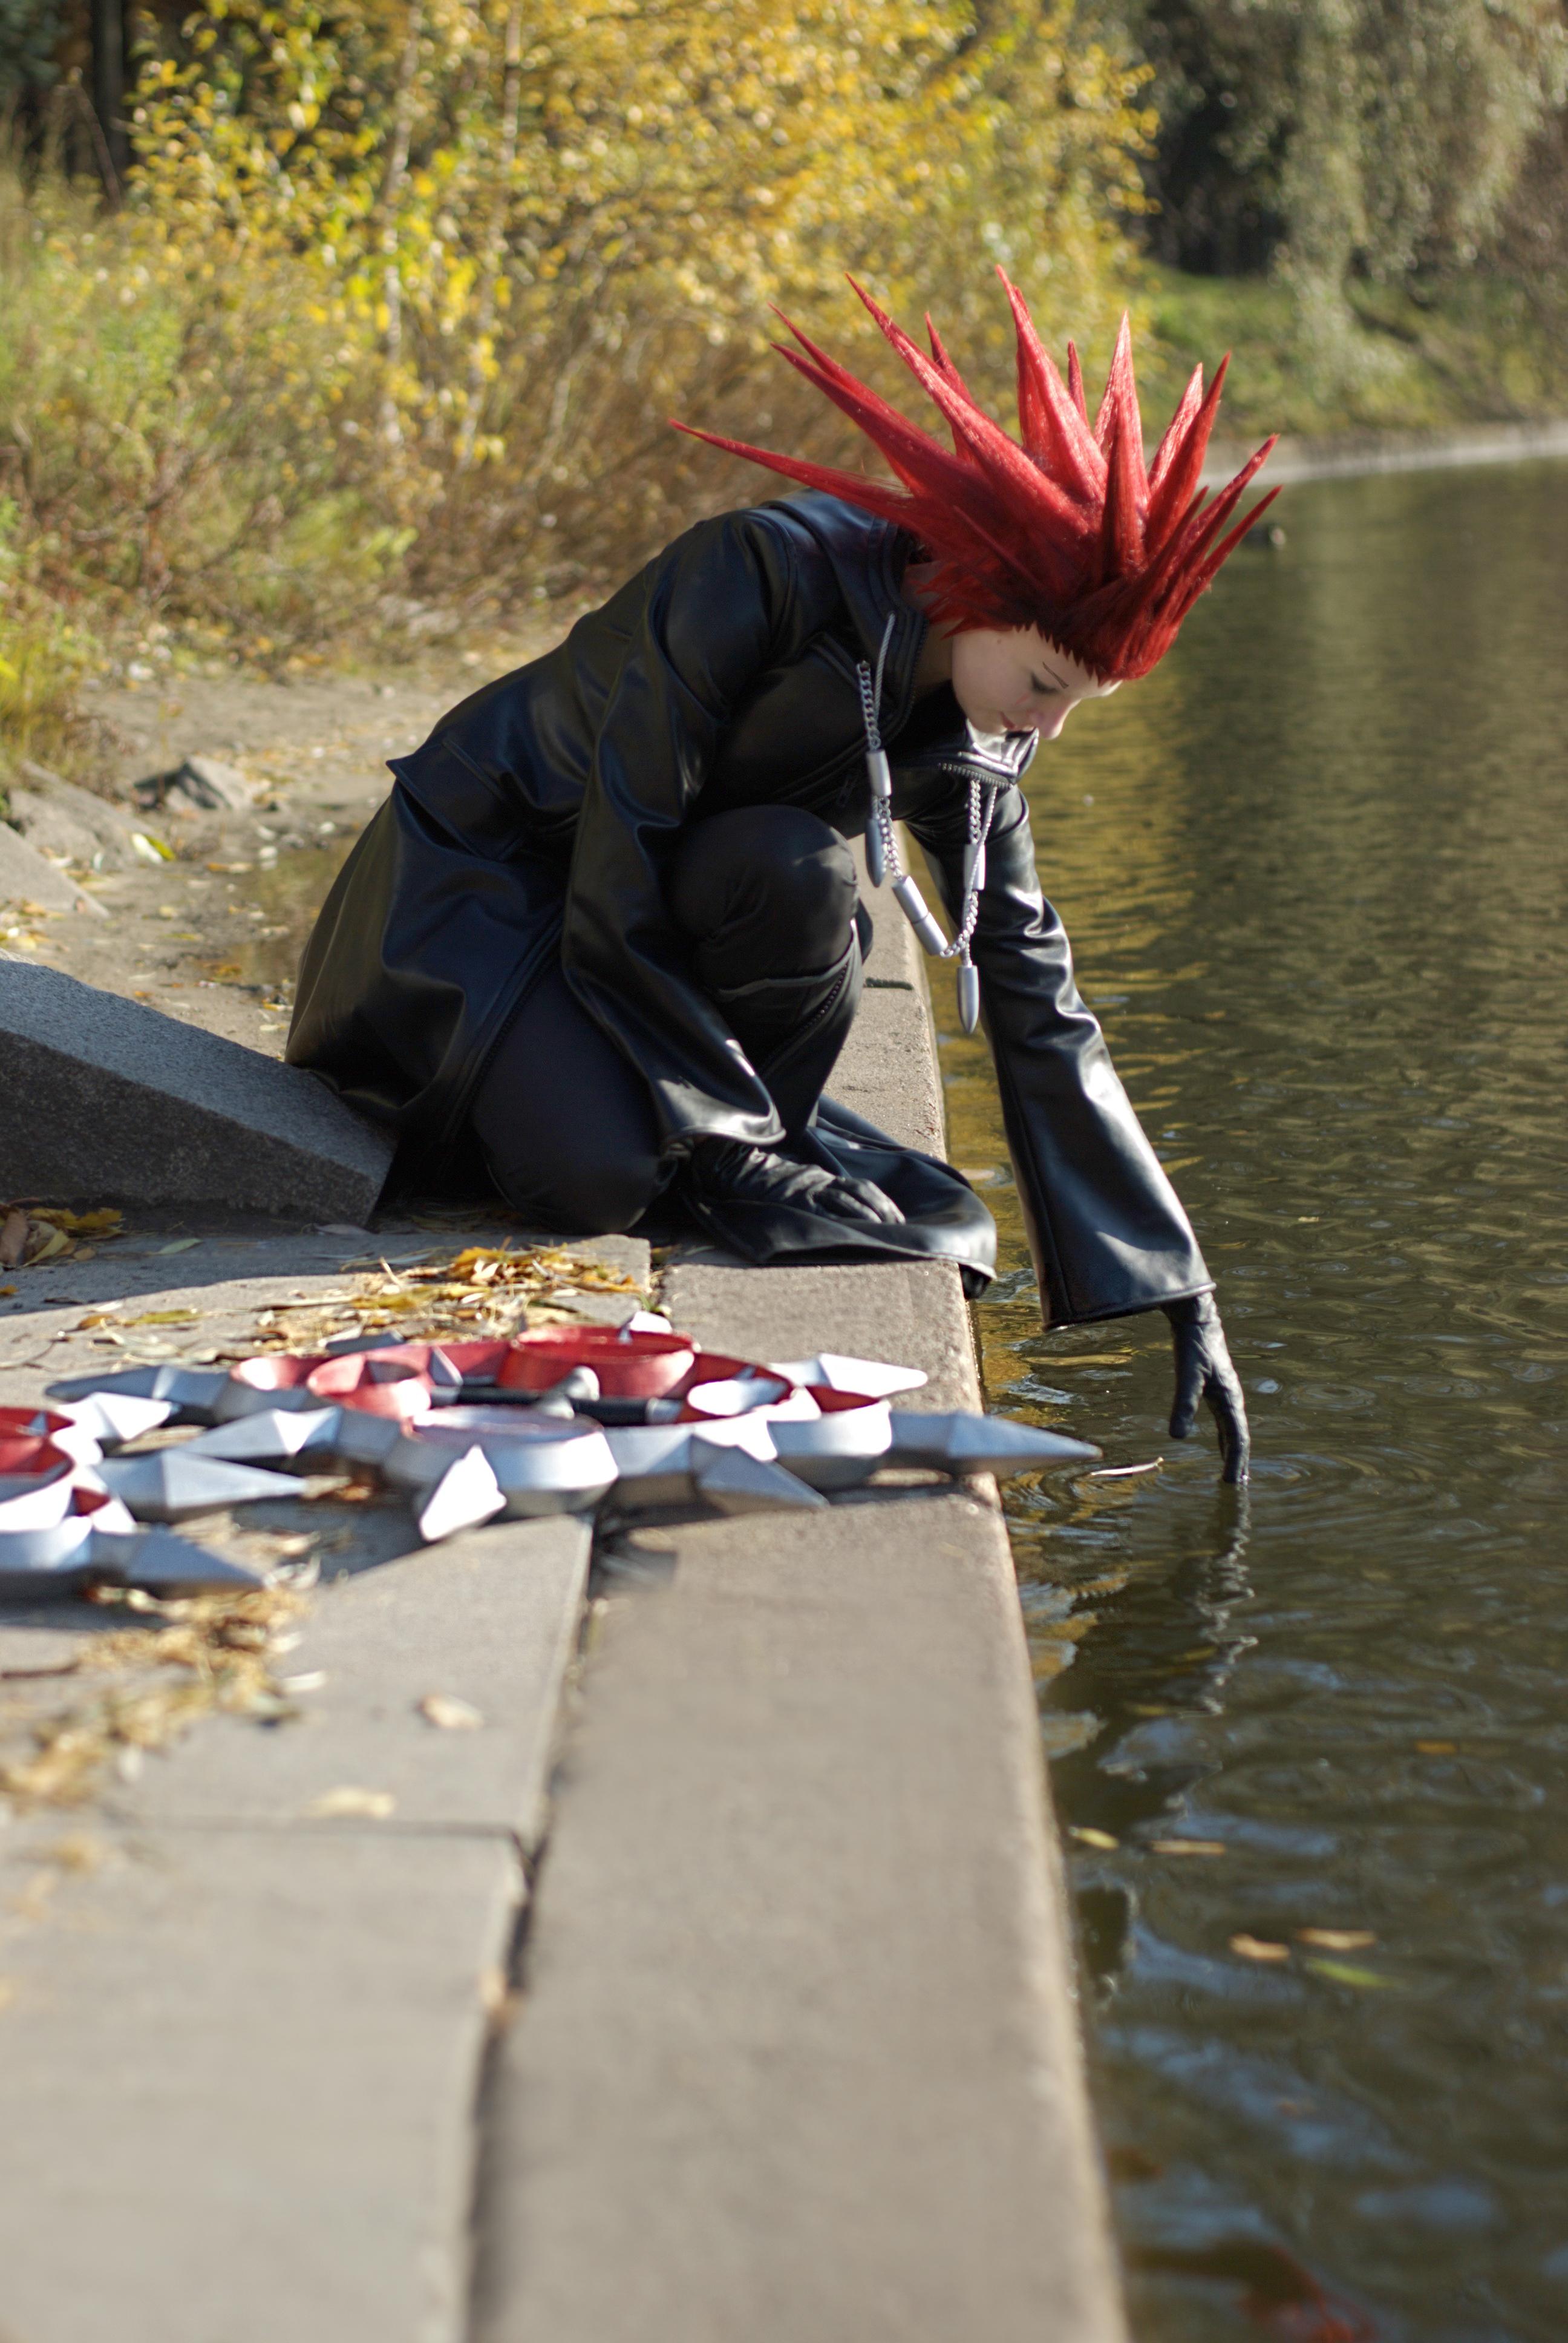 Sephiroth Kingdom Hearts Cosplay Axel kingdom hearts cosplay by